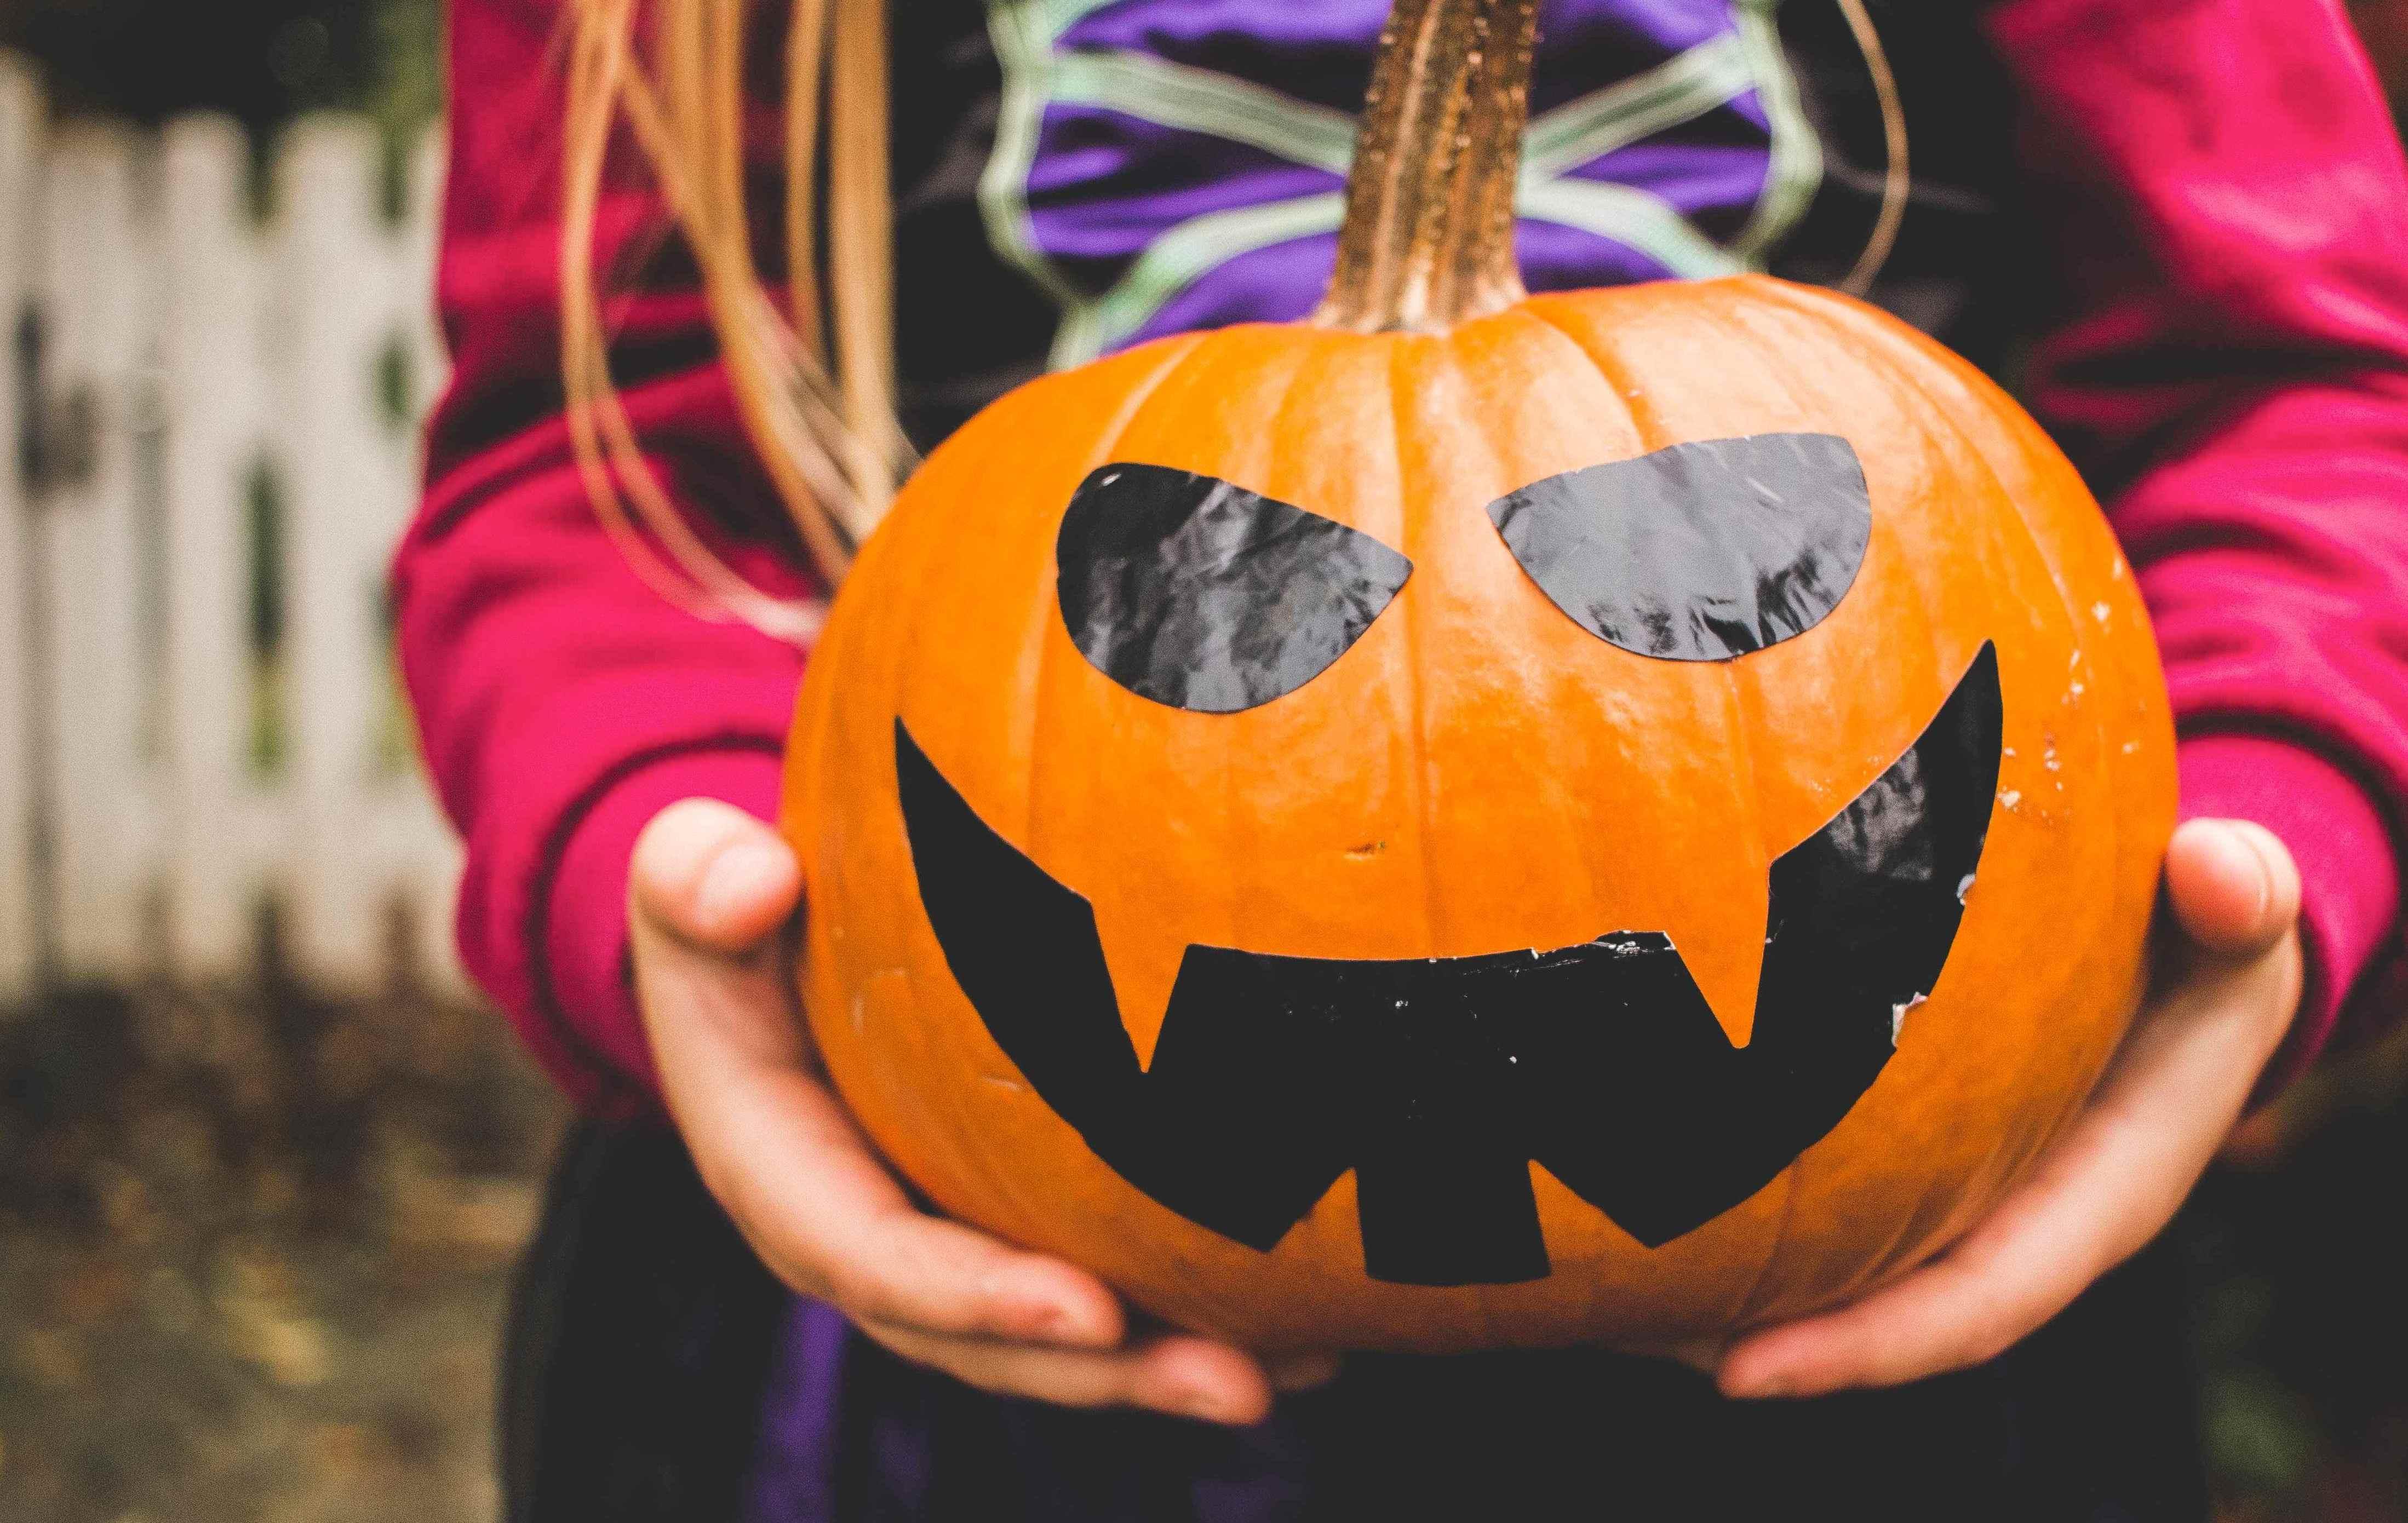 photo 1477241219470 e4f7fa400a9b 1920x1215 - 5 Creepy Halloween Destinations Worth Travelling For